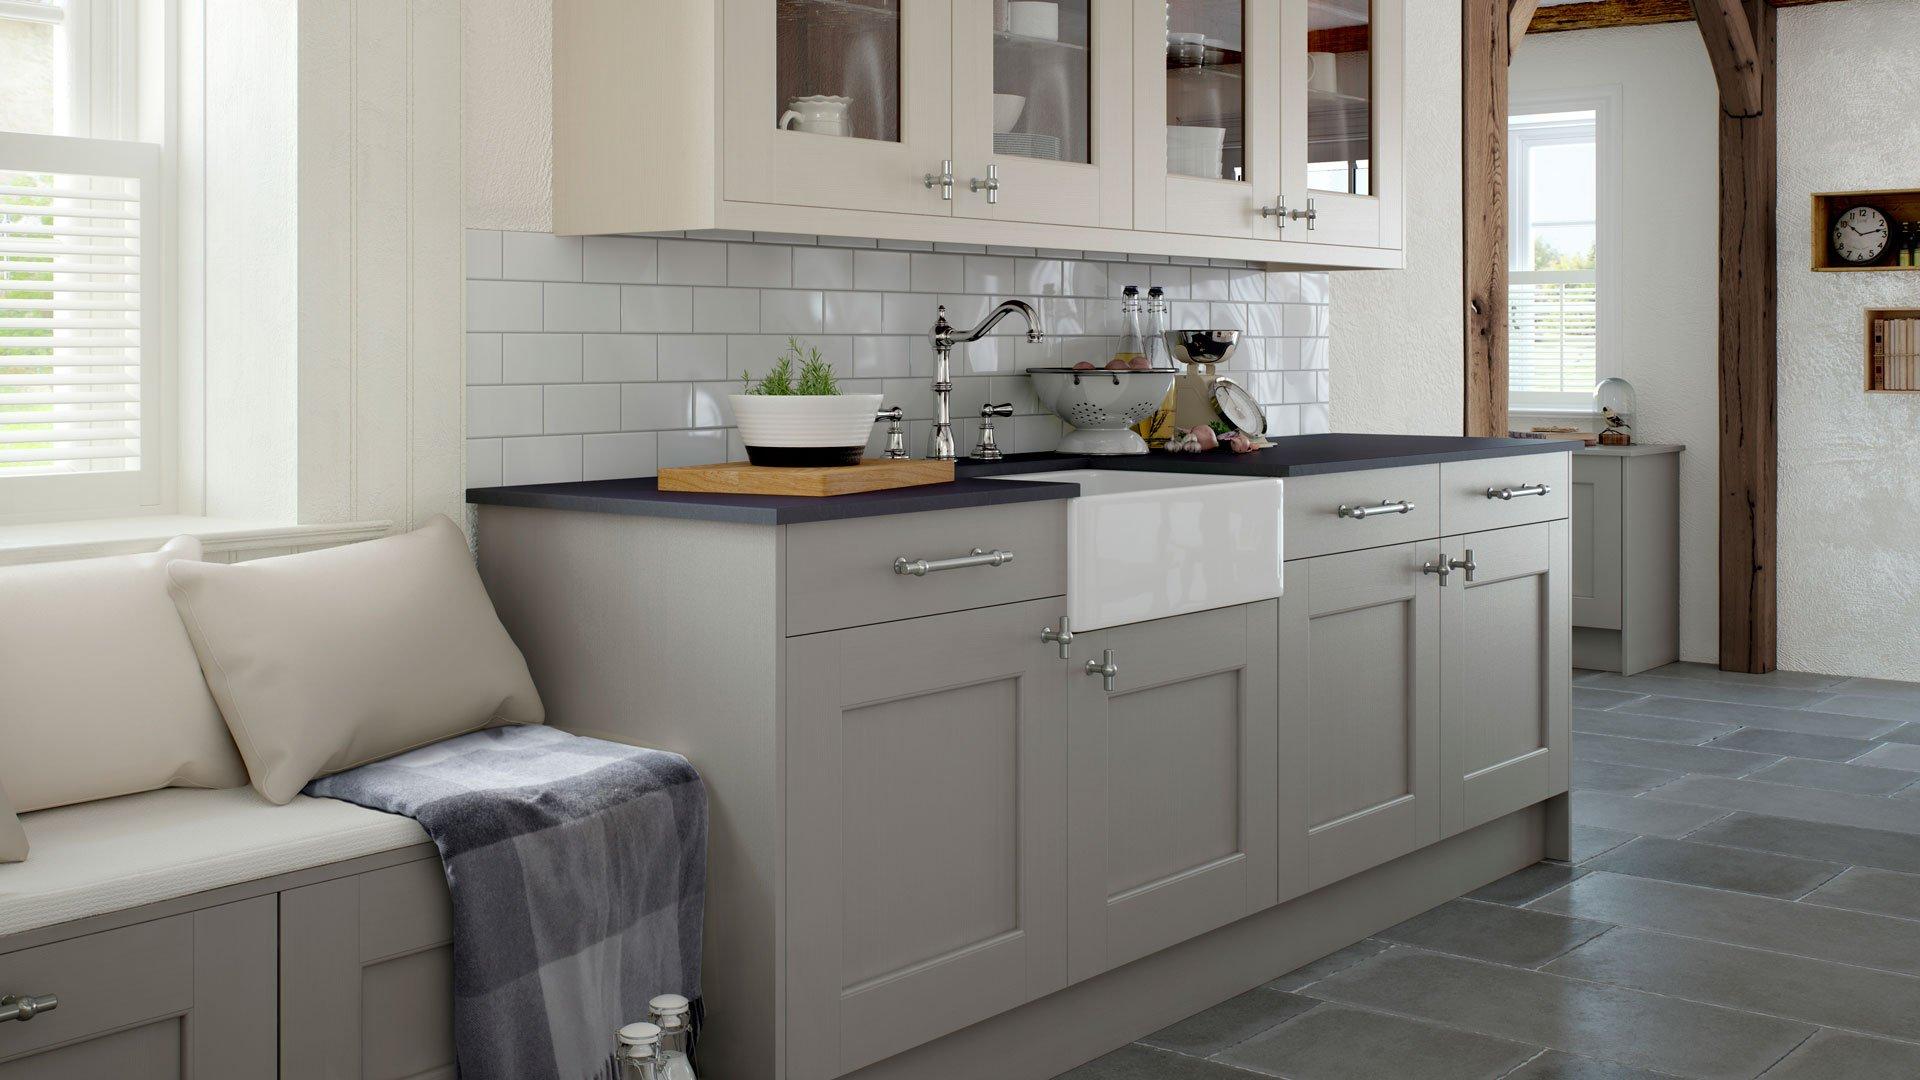 Multiwood Bowfell Bespoke Painted - Mussel  Haze Kitchen